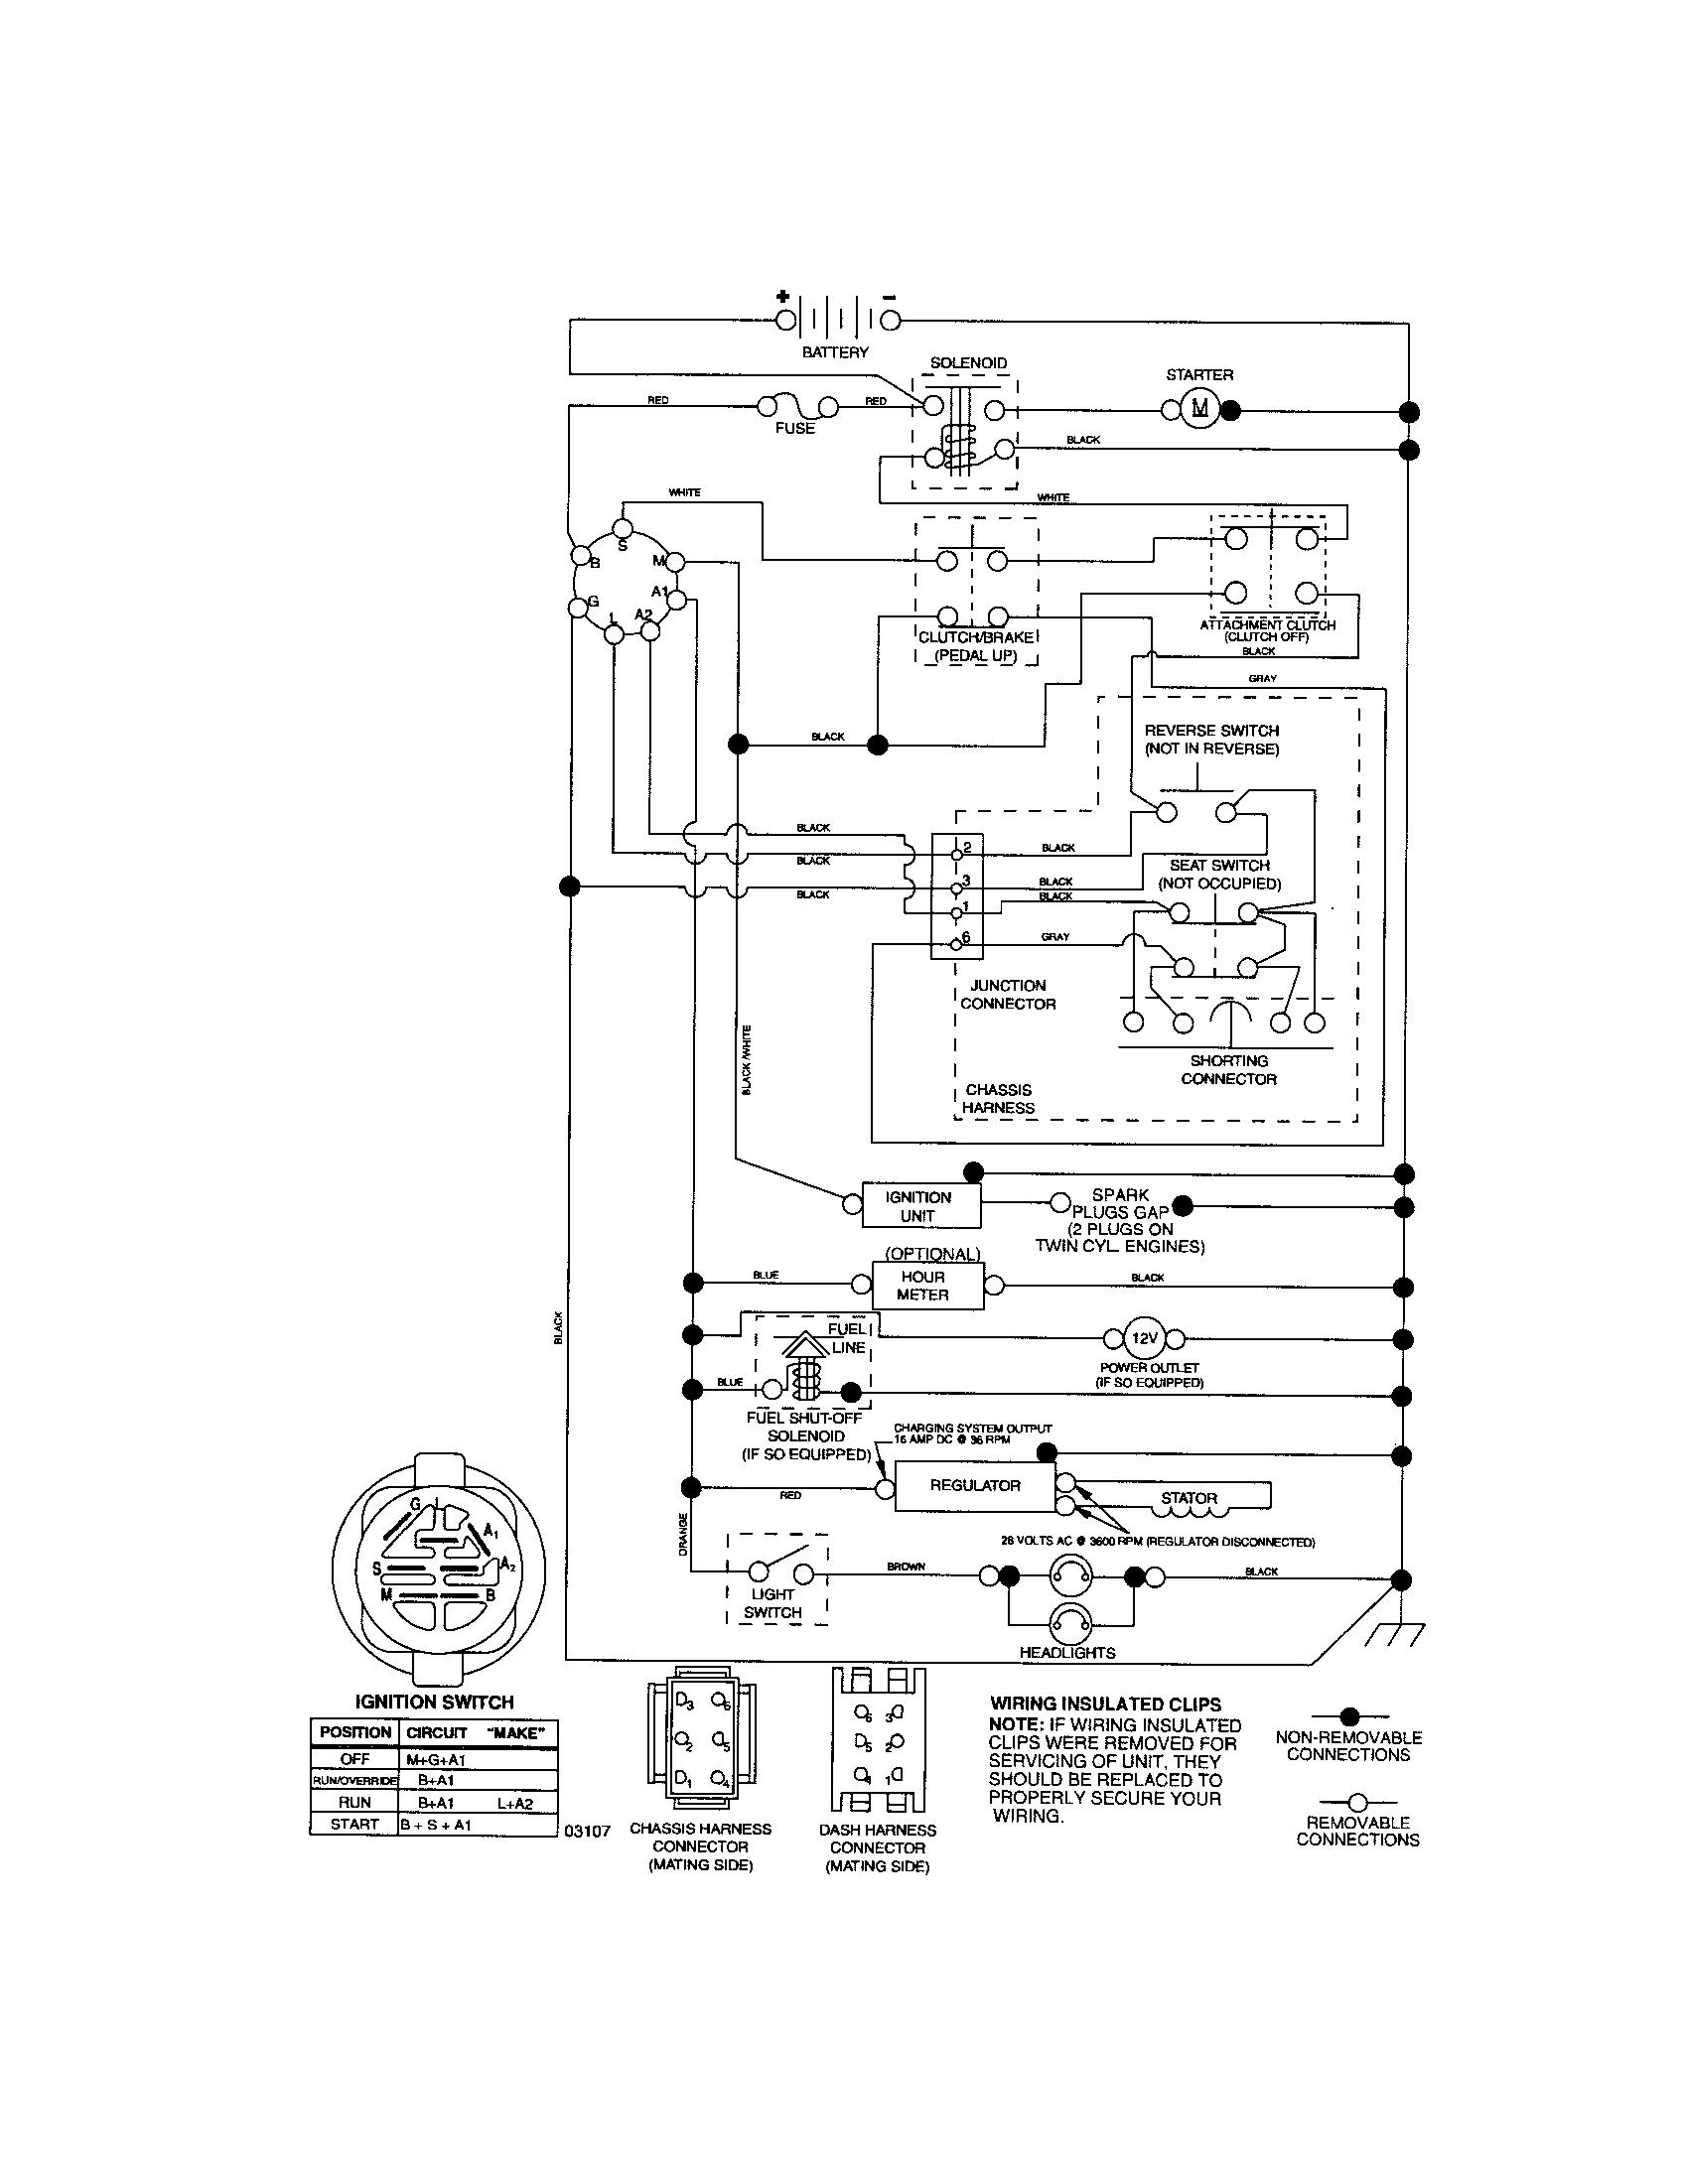 Excellent Craftsman Starter Wiring Diagram Diagram Data Schema Wiring Cloud Hylecsynyskathapolobarbaosophdenlimohammedshrineorg